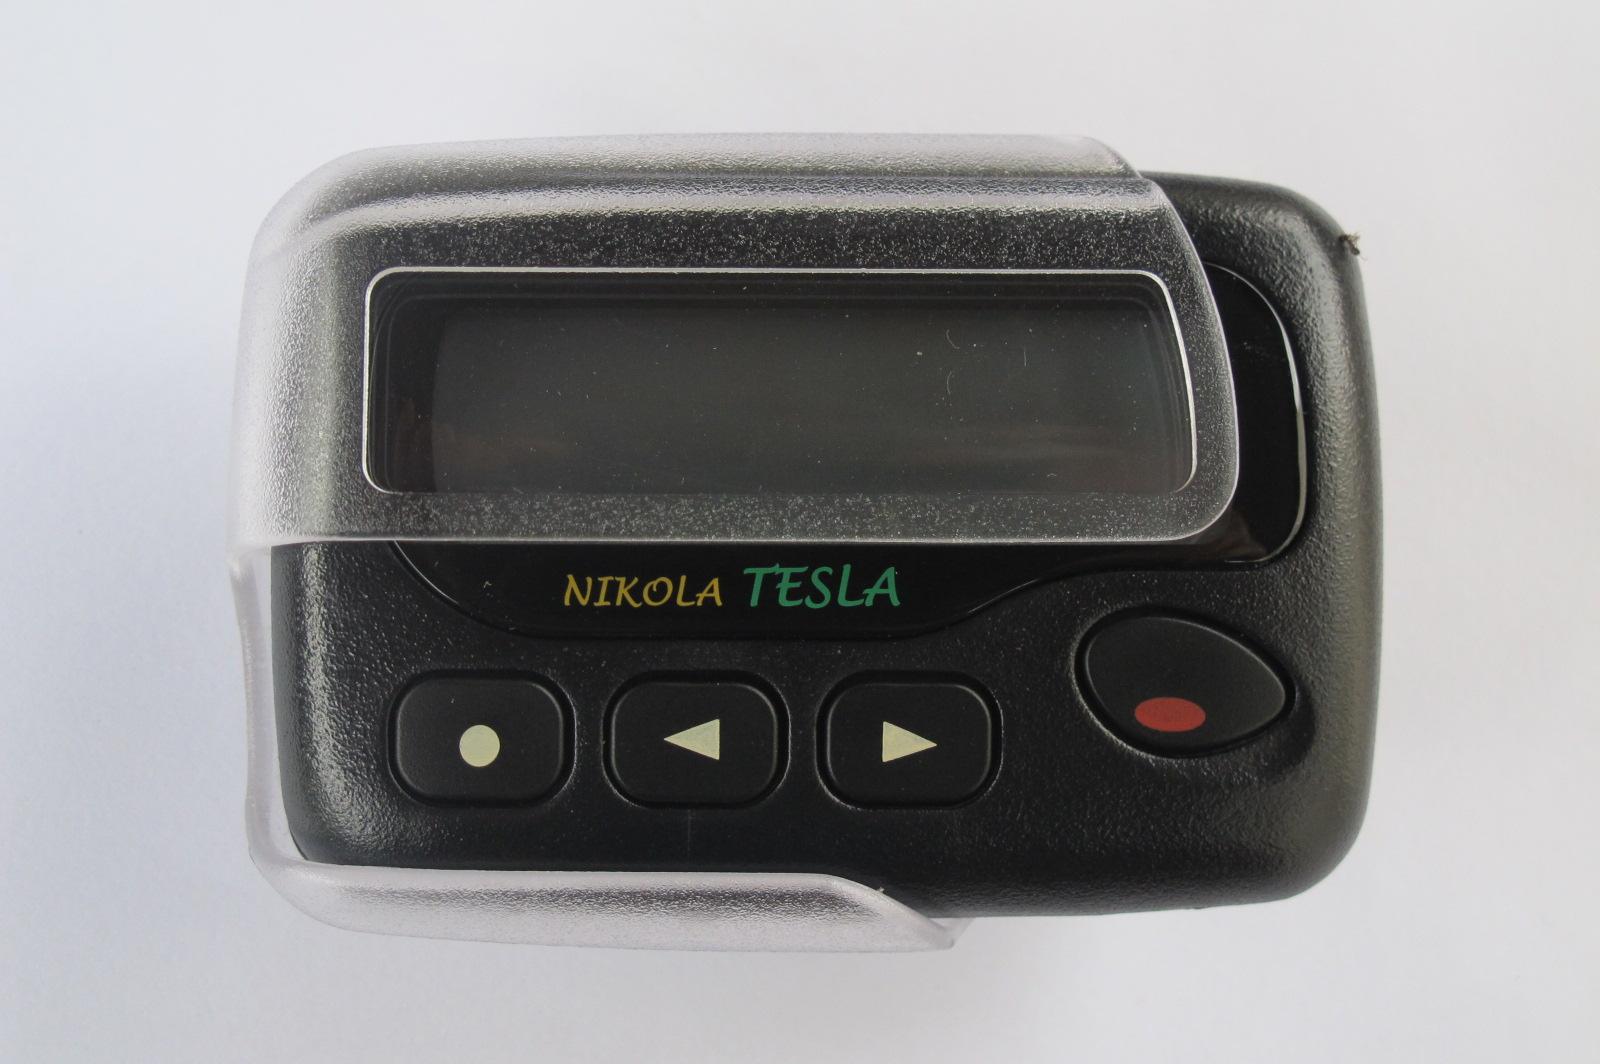 Tesla Pager Gsl28a Zalom Nurse Call Systems